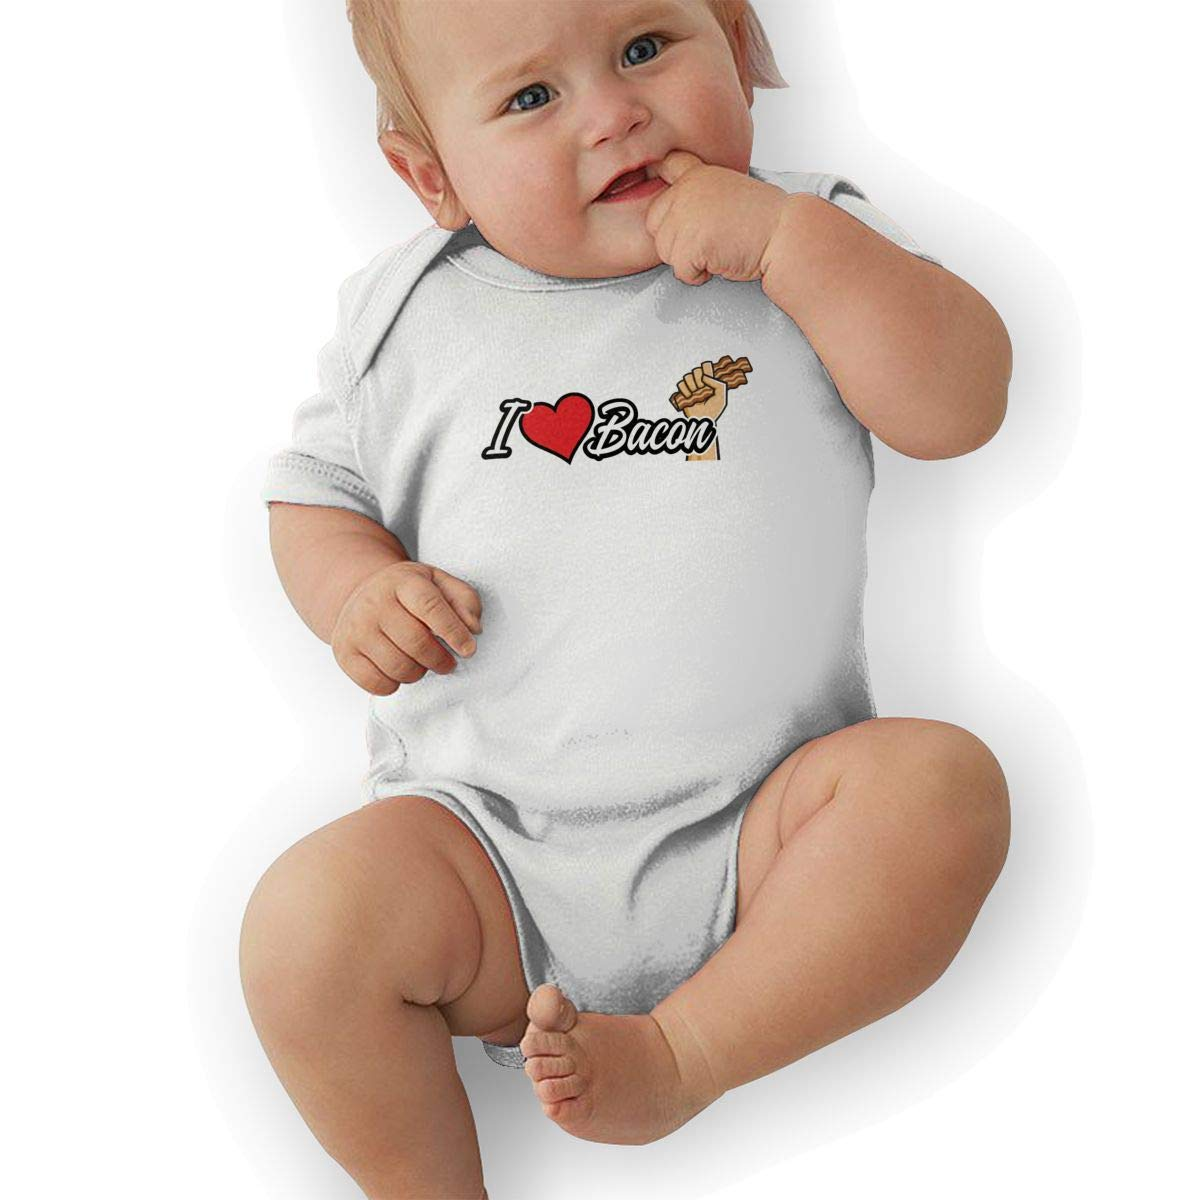 Newborn Baby Girls Bodysuit Short-Sleeve Onesie I Love Bacon Print Jumpsuit Autumn Pajamas